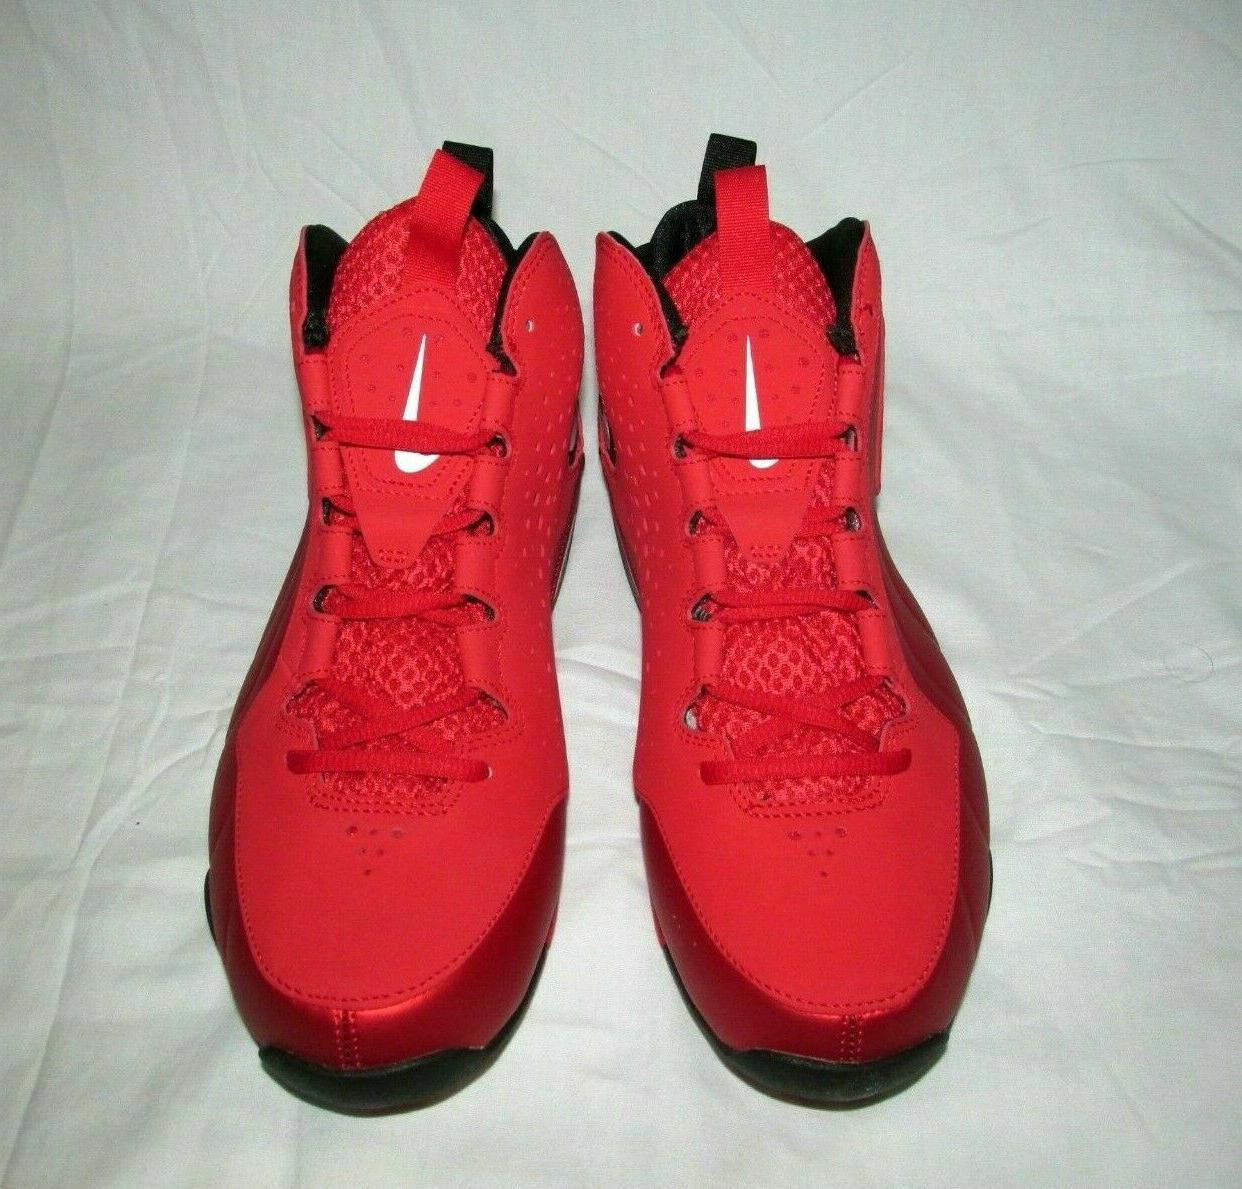 Nike Air Wavy Red